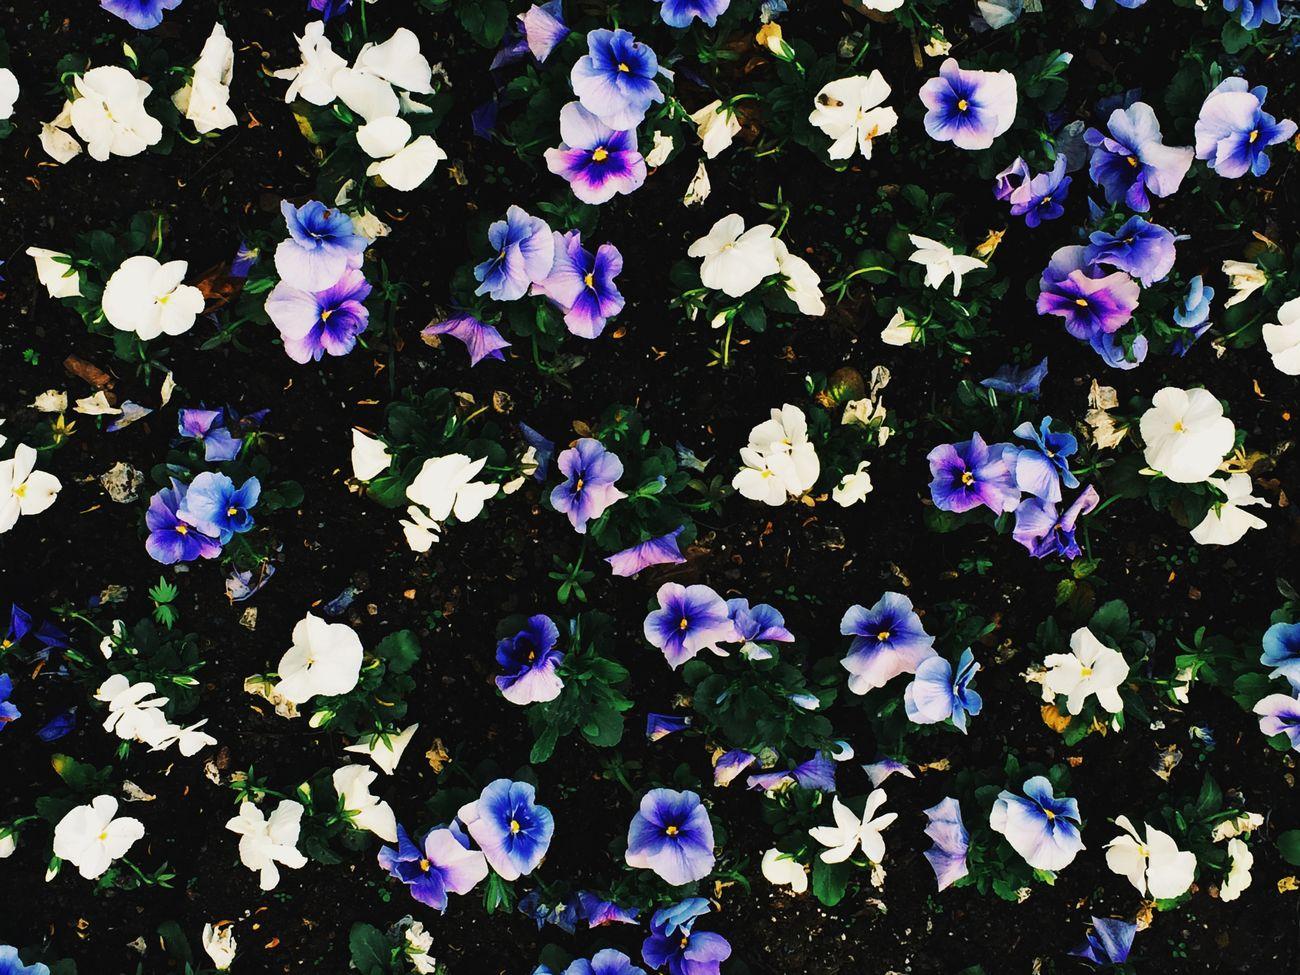 Flowers Garden Photography White Planting Gardening Colors Geometry Secret Garden Walking Details